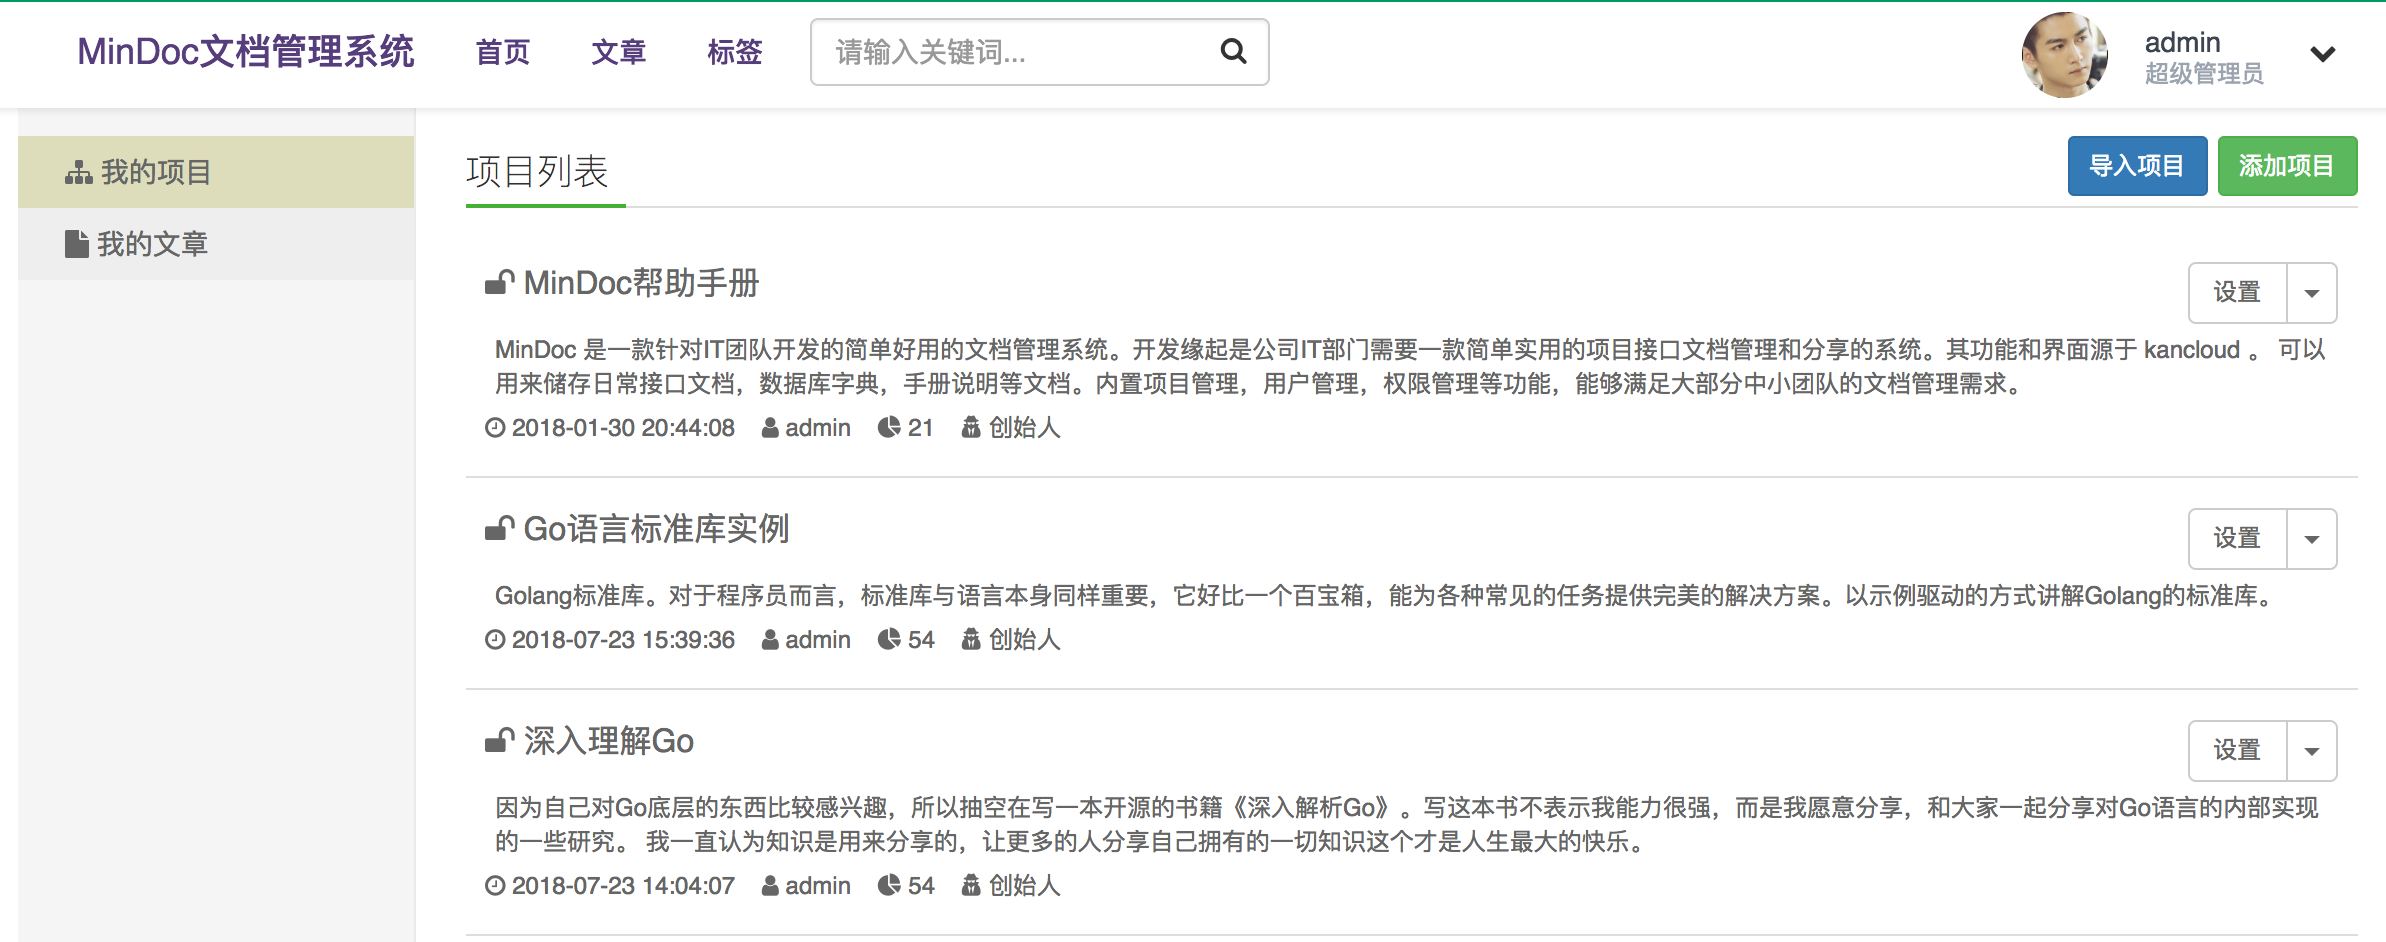 Mindoc:一款针对IT团队开发的简单好用的文档管理系统